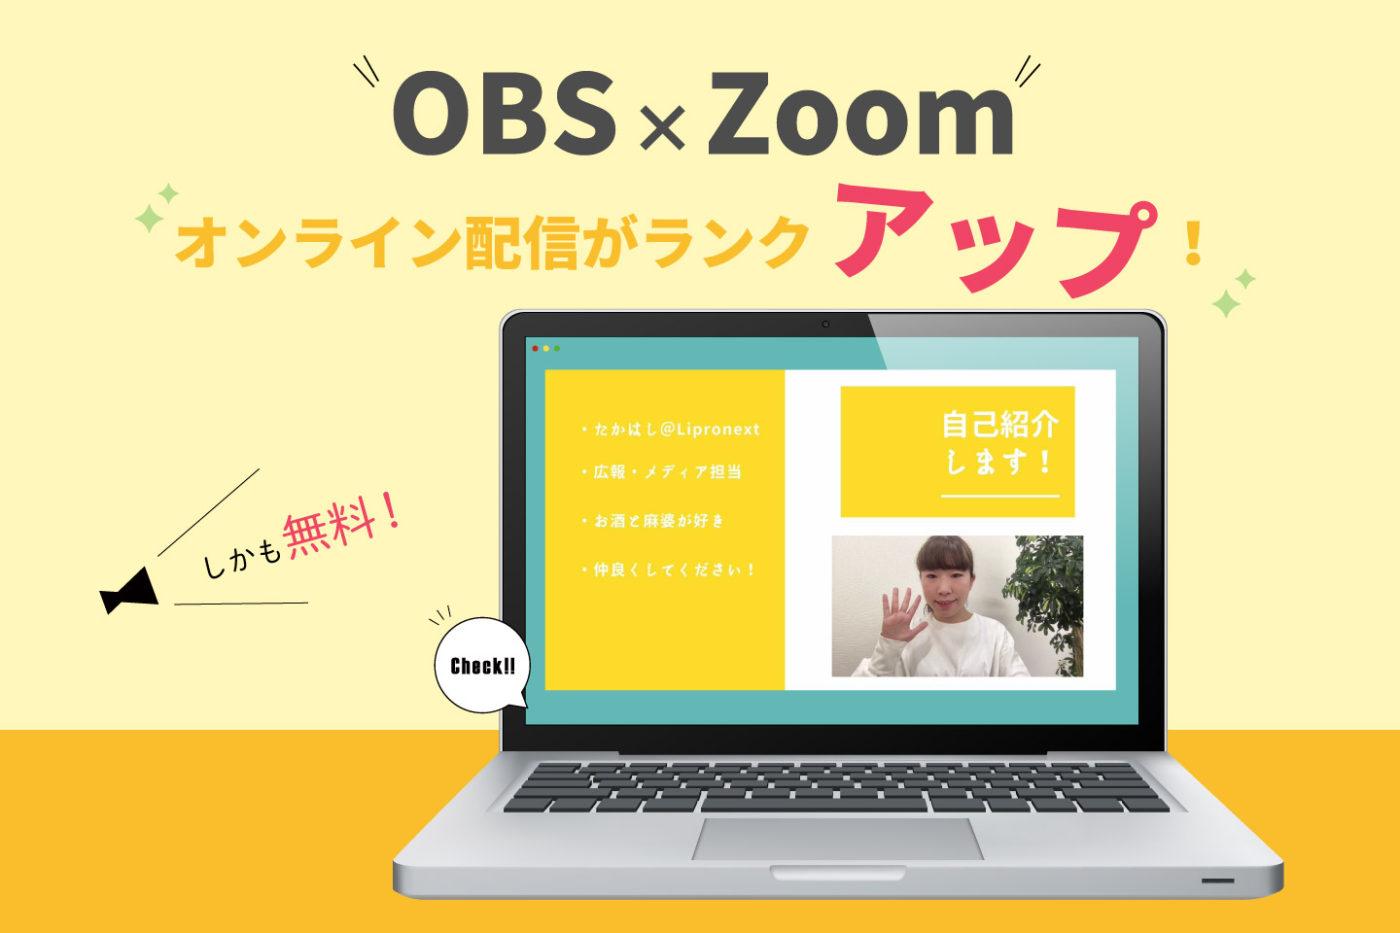 Zoom(ズーム)×OBSでリッチで楽しい! オンライン配信を実現【全部無料】